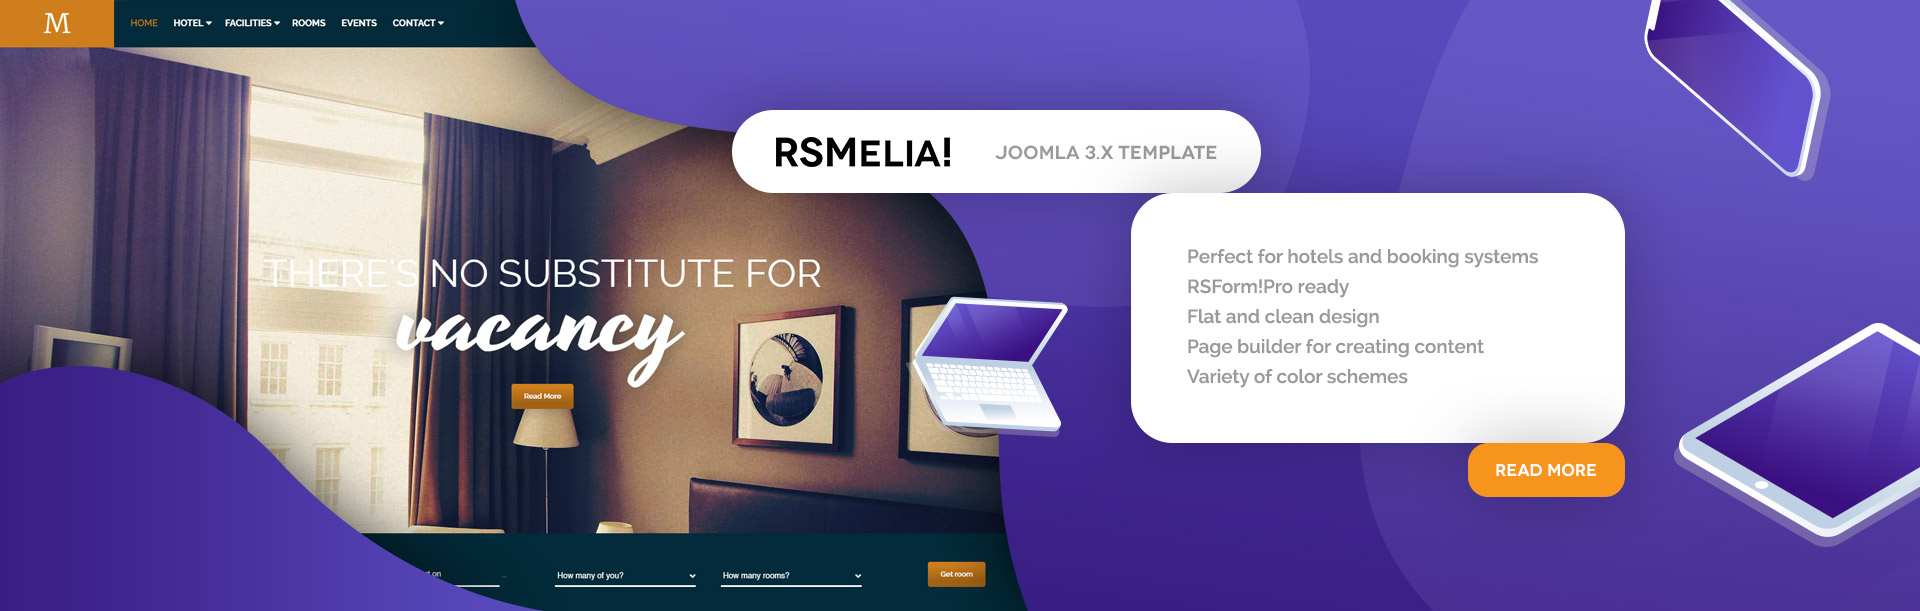 RSMelia! Template